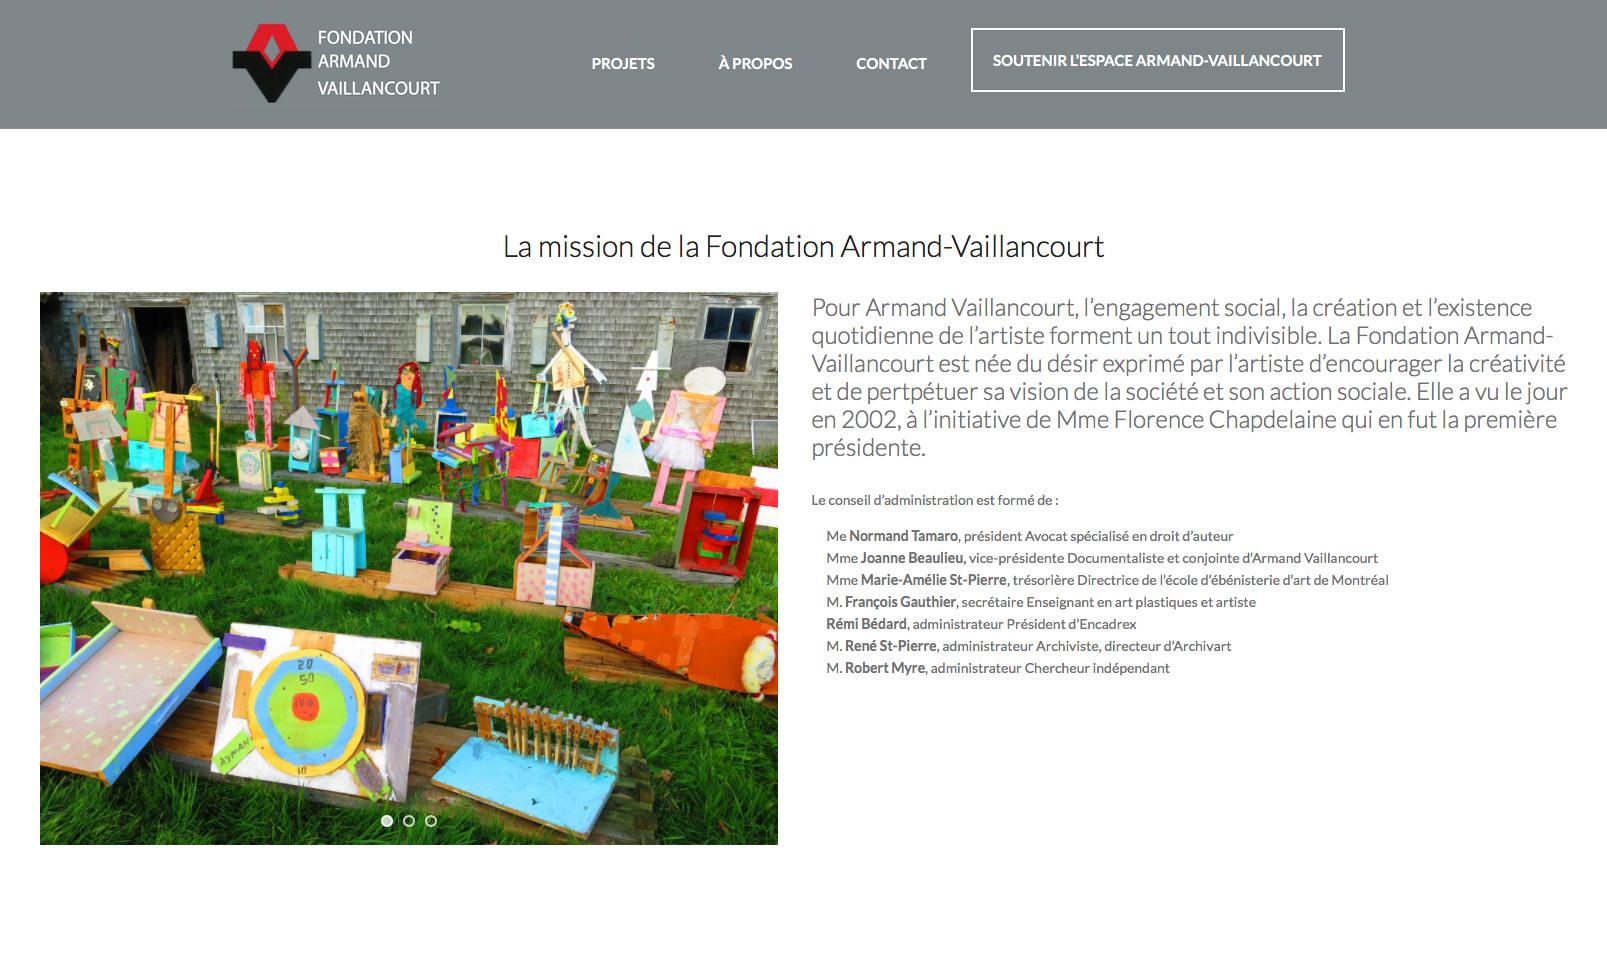 ArmandVaillancourt-01.jpg